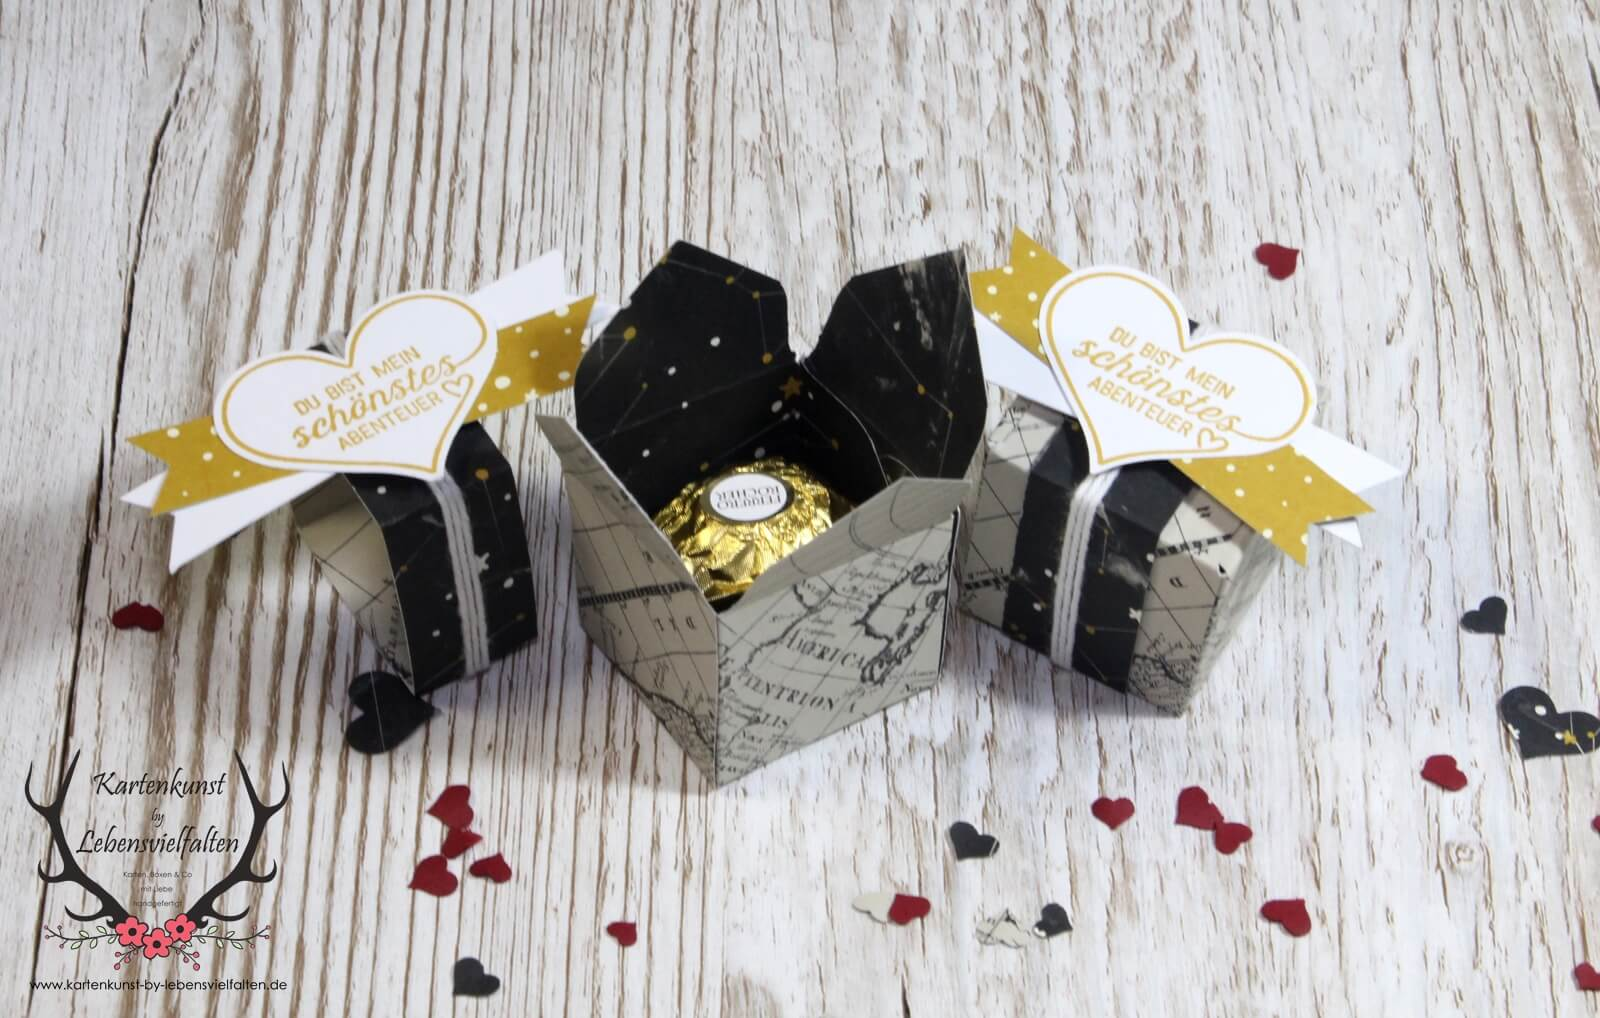 Ferrero Rocher Verpackung zum Valentinstag fr Mnner  HANDMADE Kultur